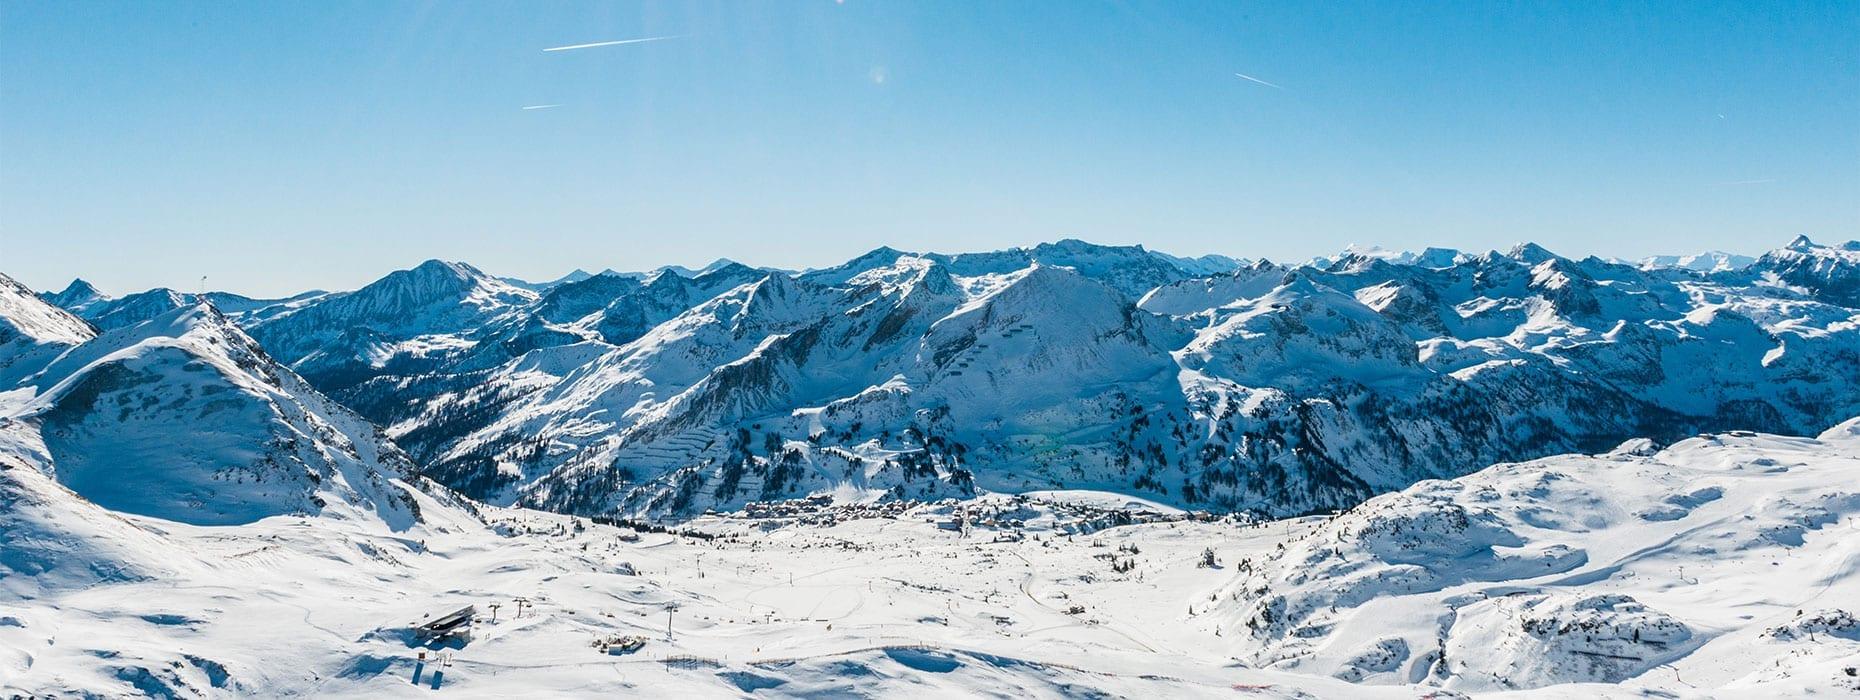 Skiurlaub & Winterurlaub in Obertauern